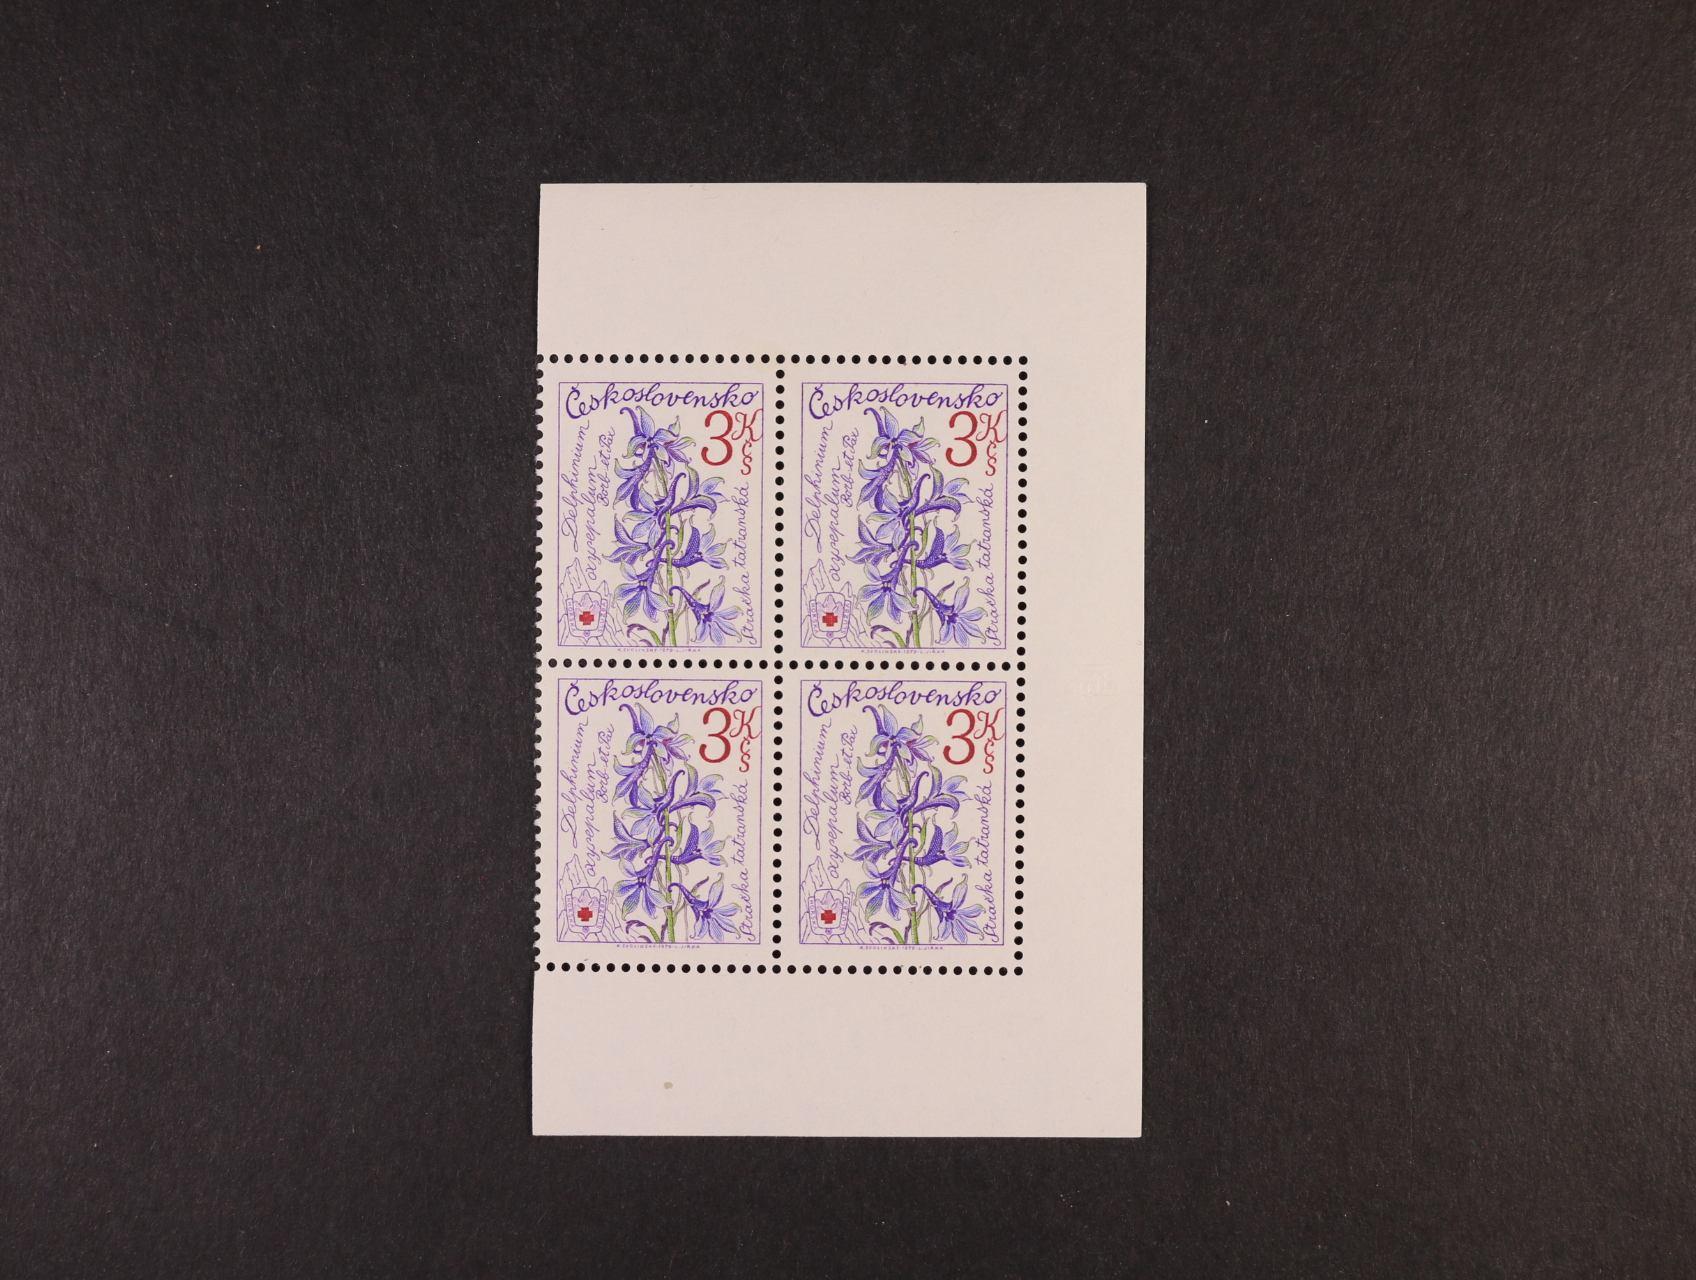 zn. č. 2369 A Rz 11 3/4 ve čtyřbloku s okraji, kat. cena 1800 Kč